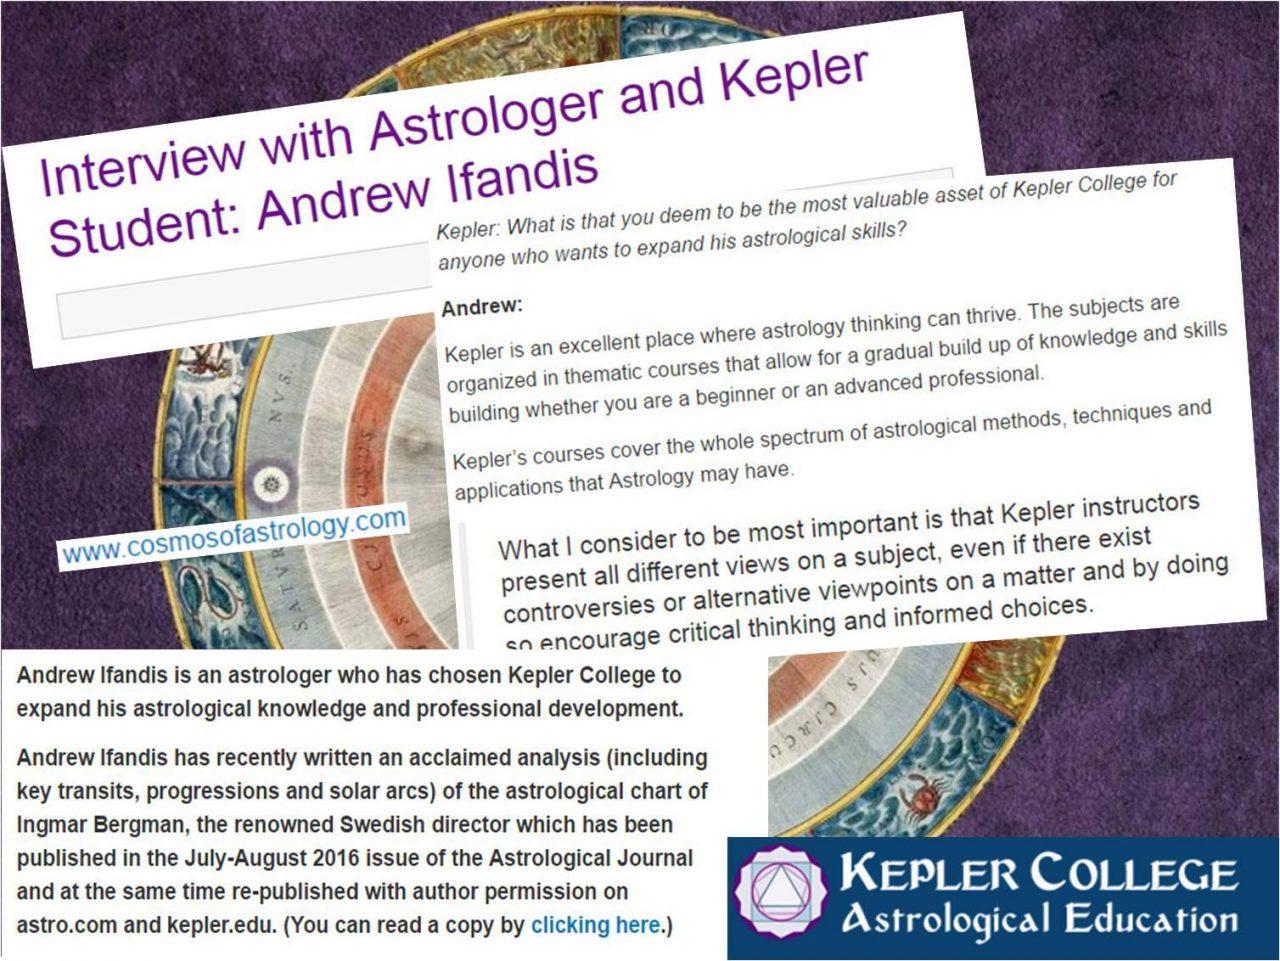 KEPLER COLLEGE: INTERVIEW WITH ASTROLOGER ANDREW IFANDIS